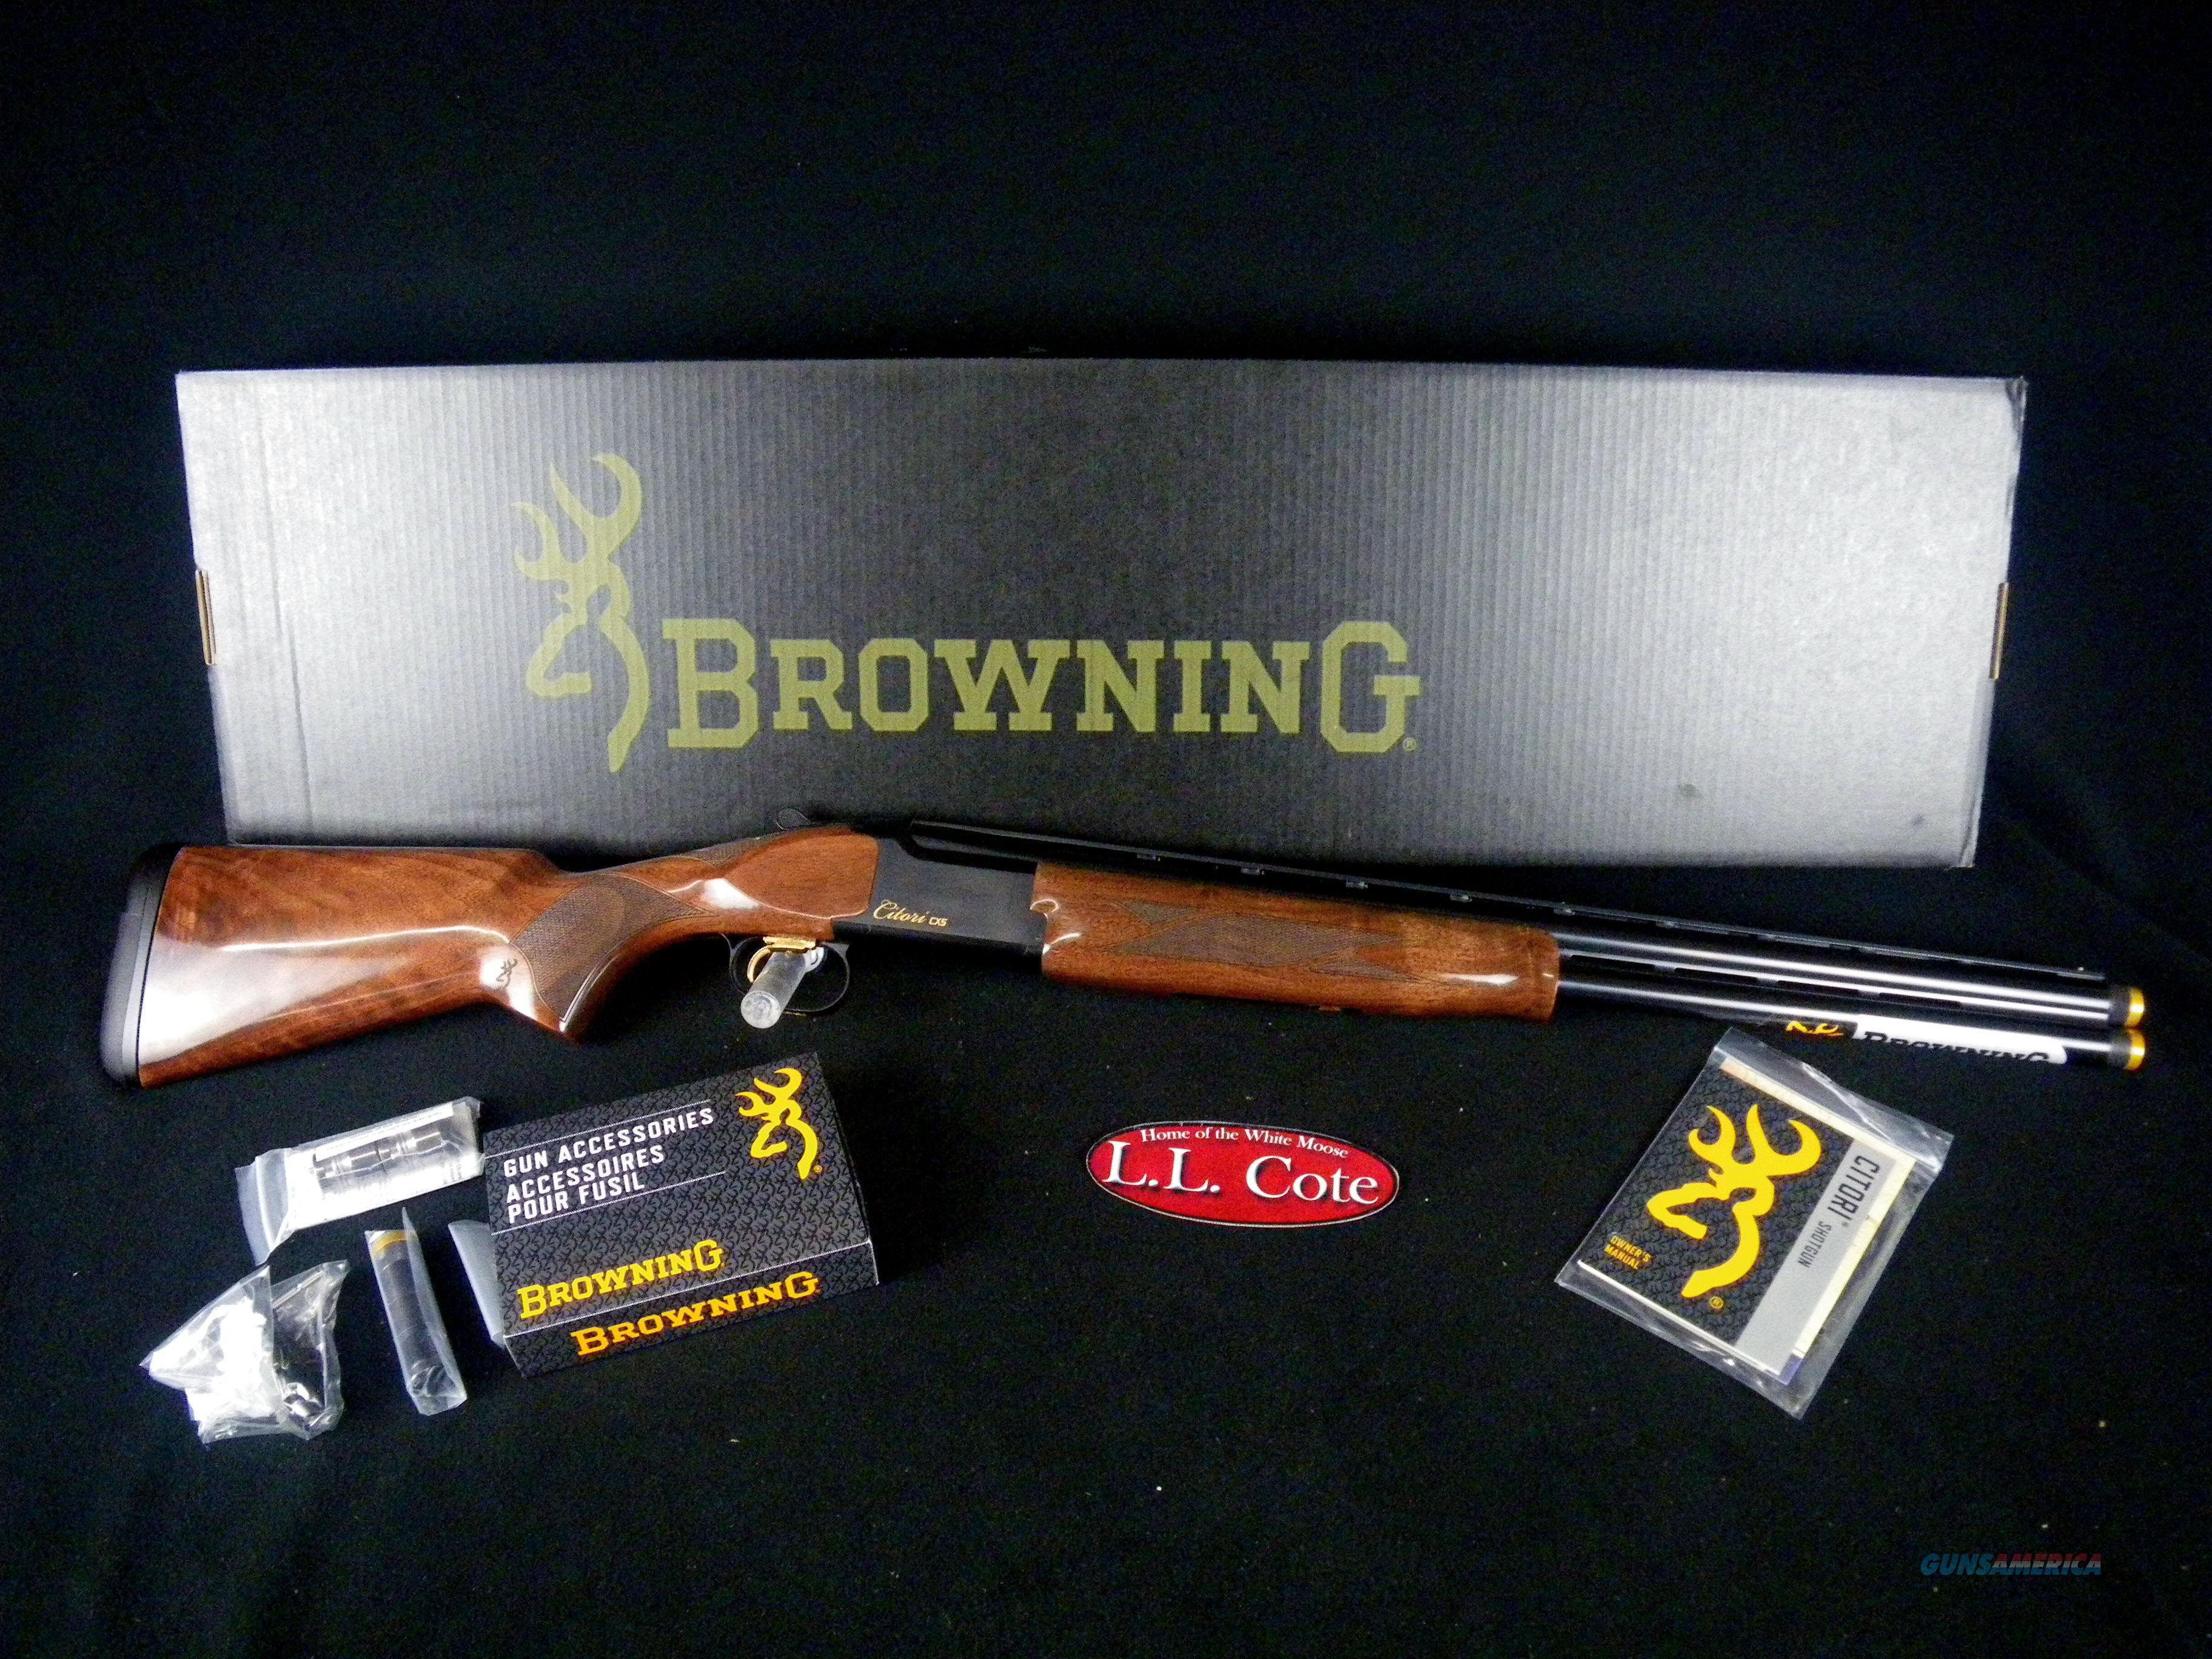 "Browning Citori CXS Micro 12ga 24"" NEW 3"" 018140306  Guns > Shotguns > Browning Shotguns > Over Unders > Citori > Hunting"